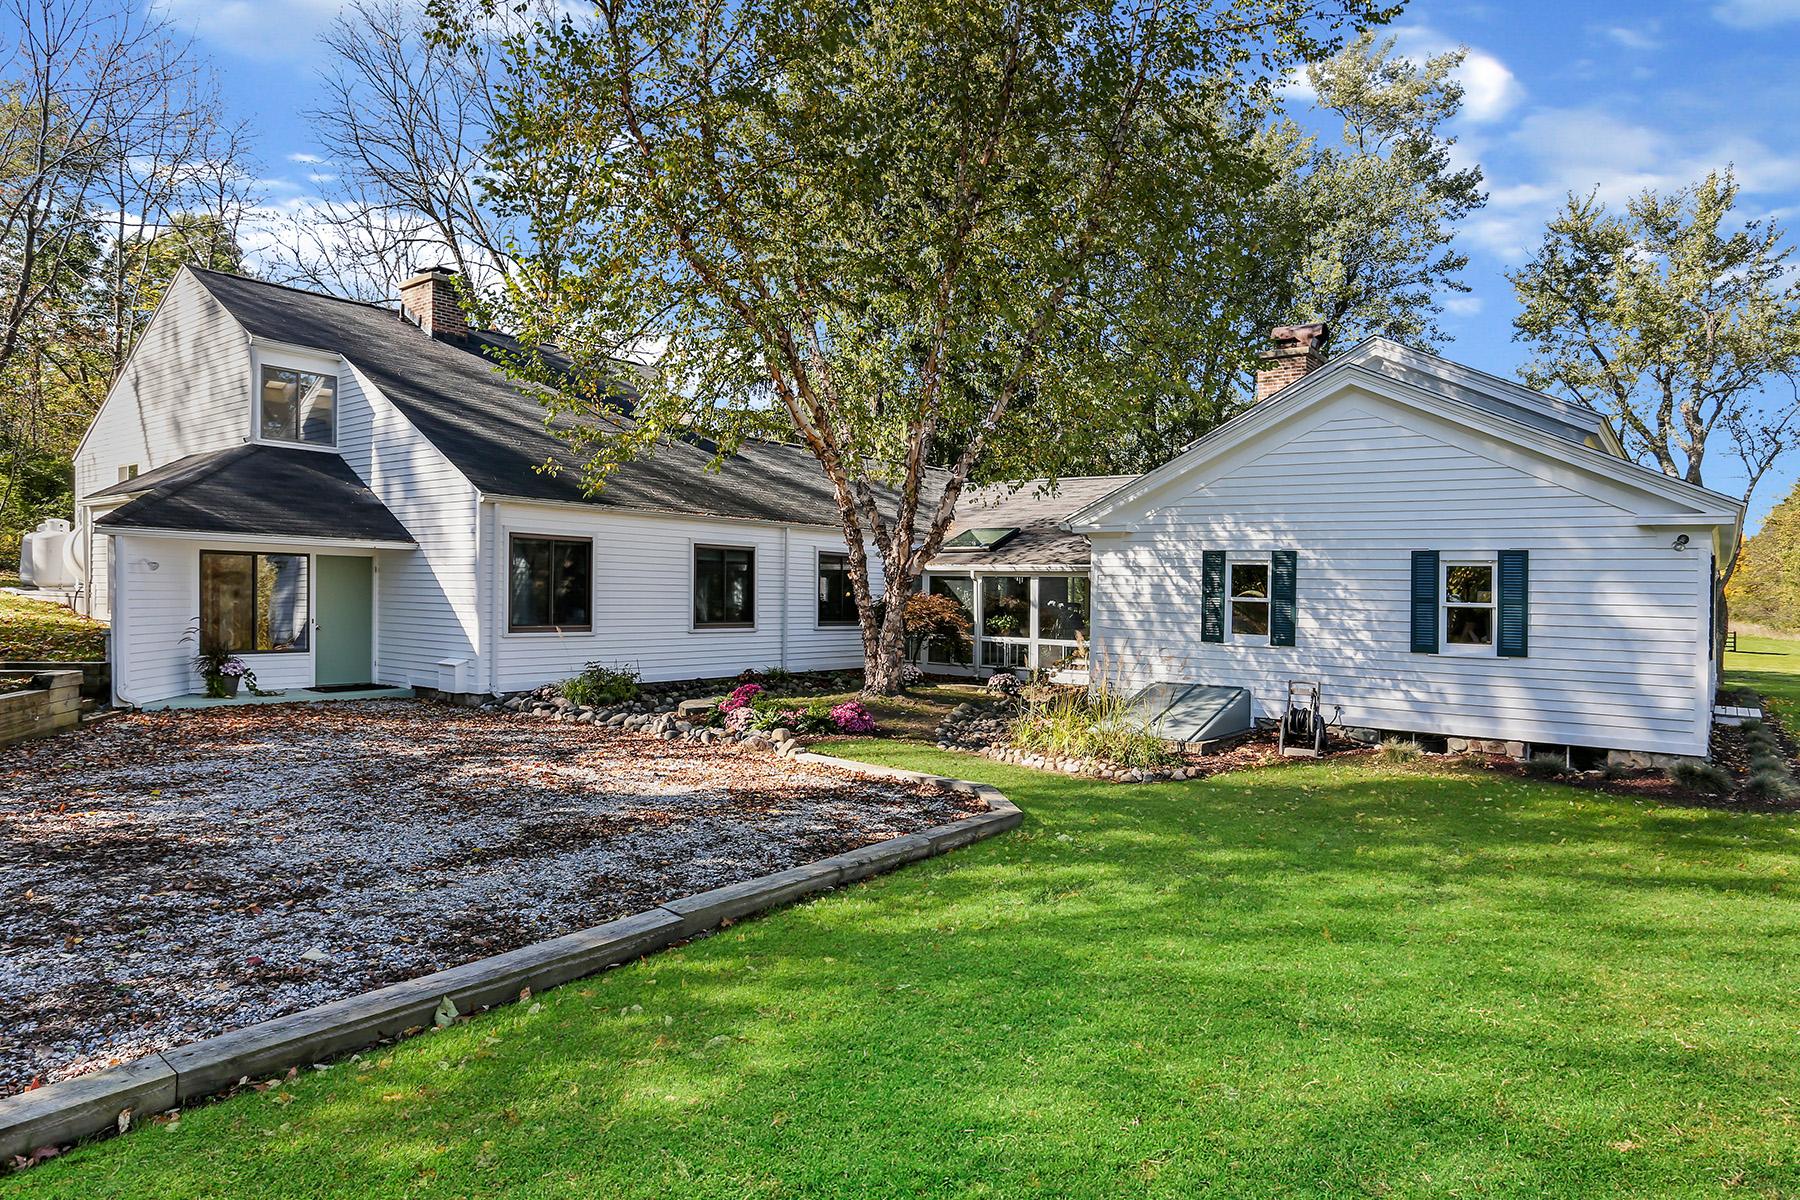 Single Family Homes for Sale at Metamora Township 3809 Wilder Road Metamora, Michigan 48455 United States